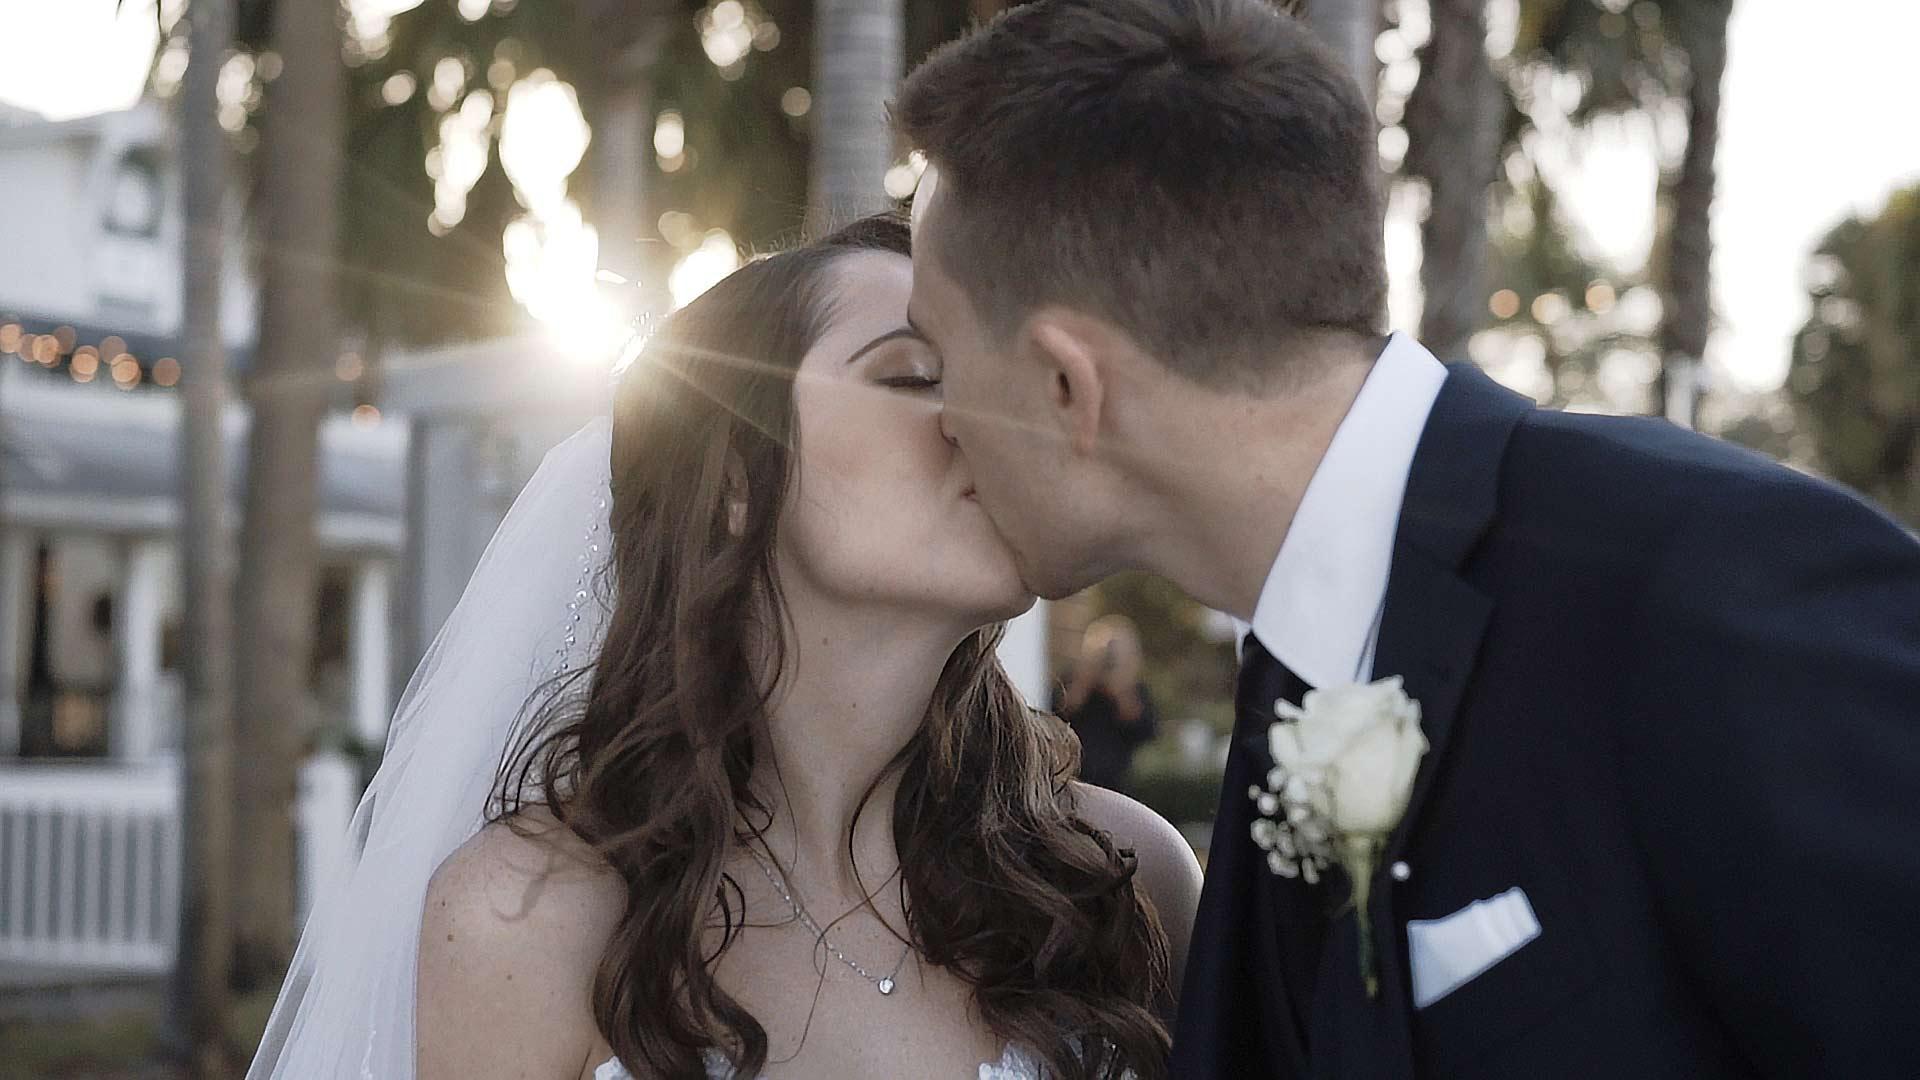 Steven + Allison   Jupiter, Florida   Out of the Blue Waterfront Weddings & Events